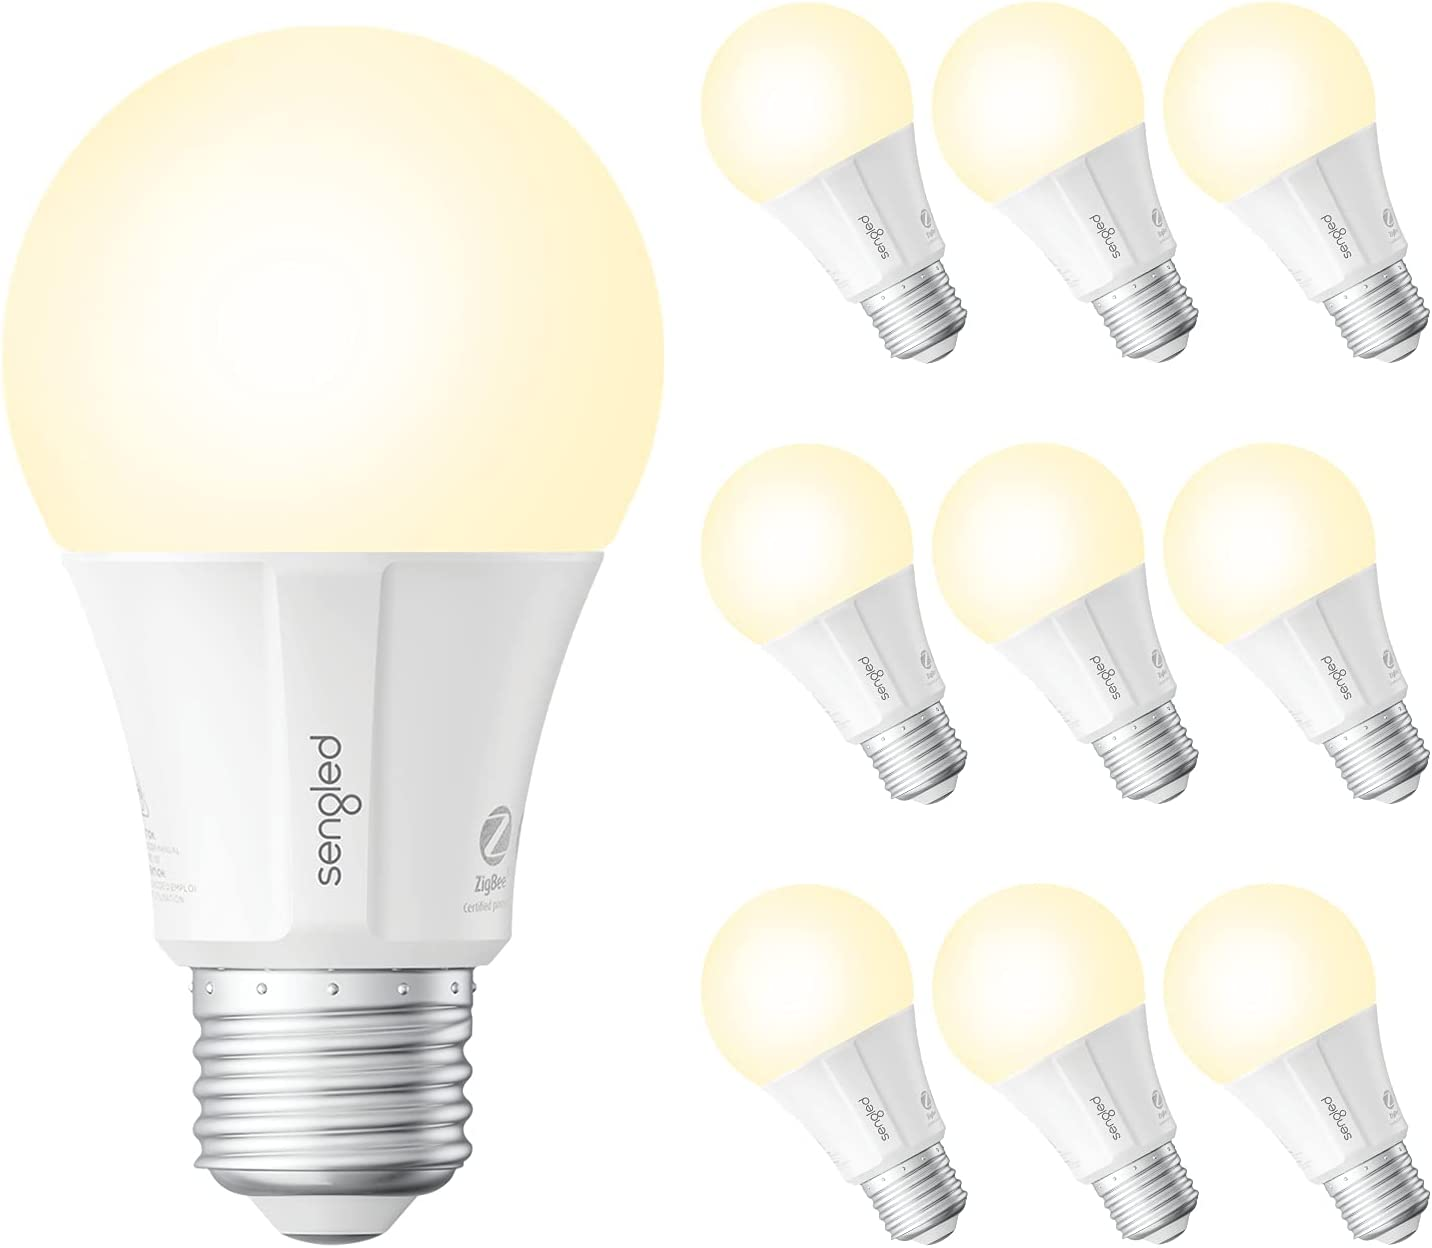 Sengled Smart Bulbs, Smart Light Bulbs That Work with Alexa, Google Home, 800LM Soft White (2700K), A19 E26 Dimmable Smart Led Bulb, 9W (60W Equivalent), Zigbee Smart Hub Required, 10 Pack